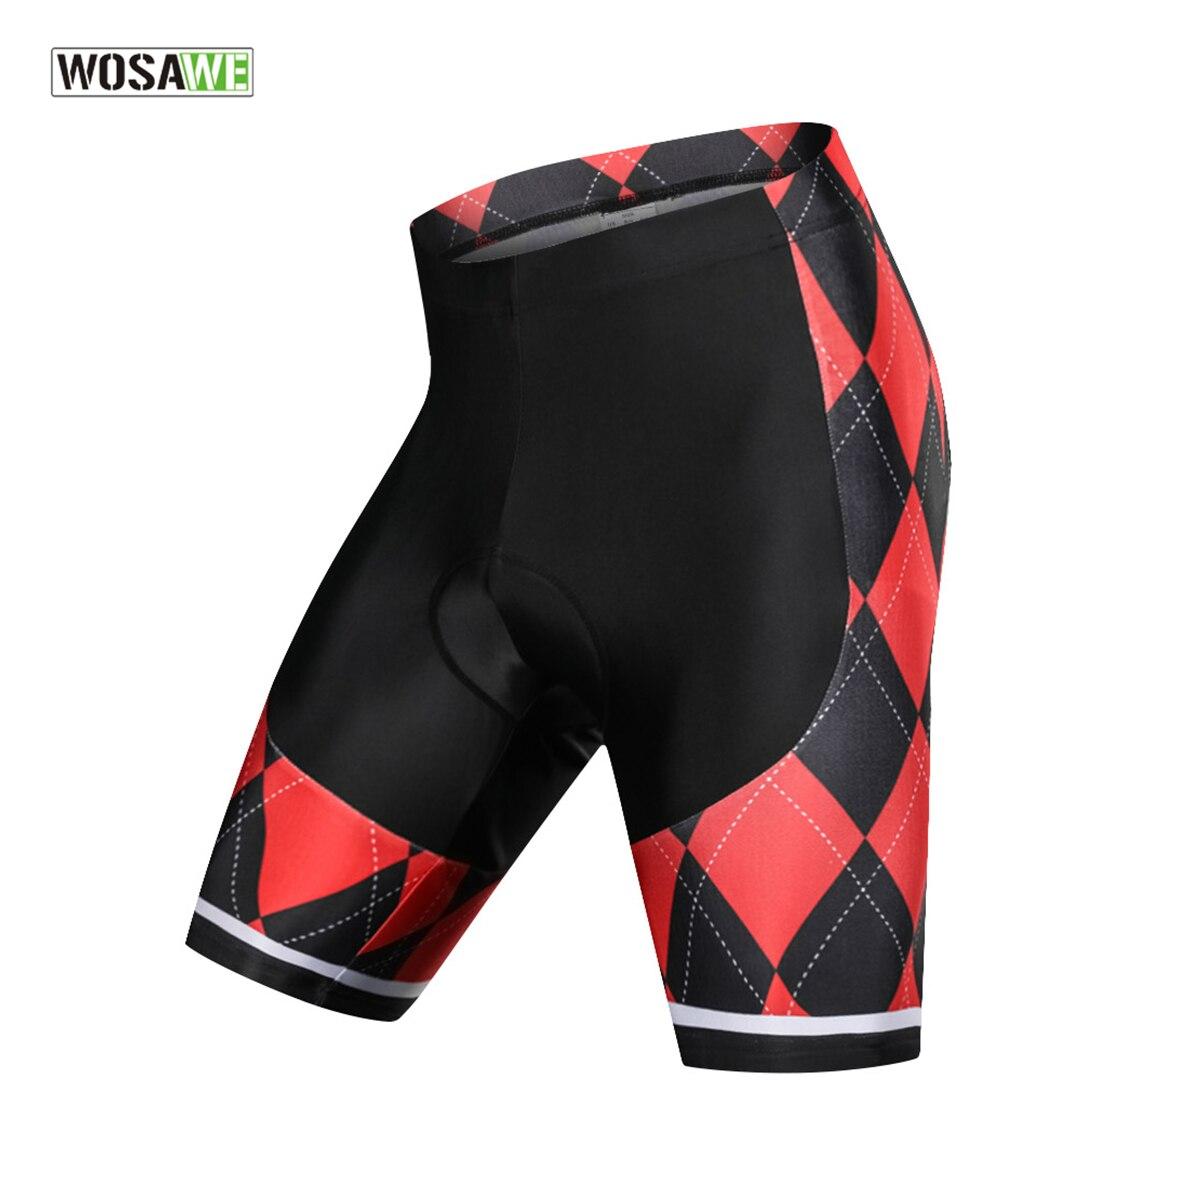 WOSAWE Gel Padded Anti Slip Cycling Shorts Men Downhill MTB Road Bike Shorts Red Bicycle Bermuda Ciclismo Ropa Ciclismo Tights